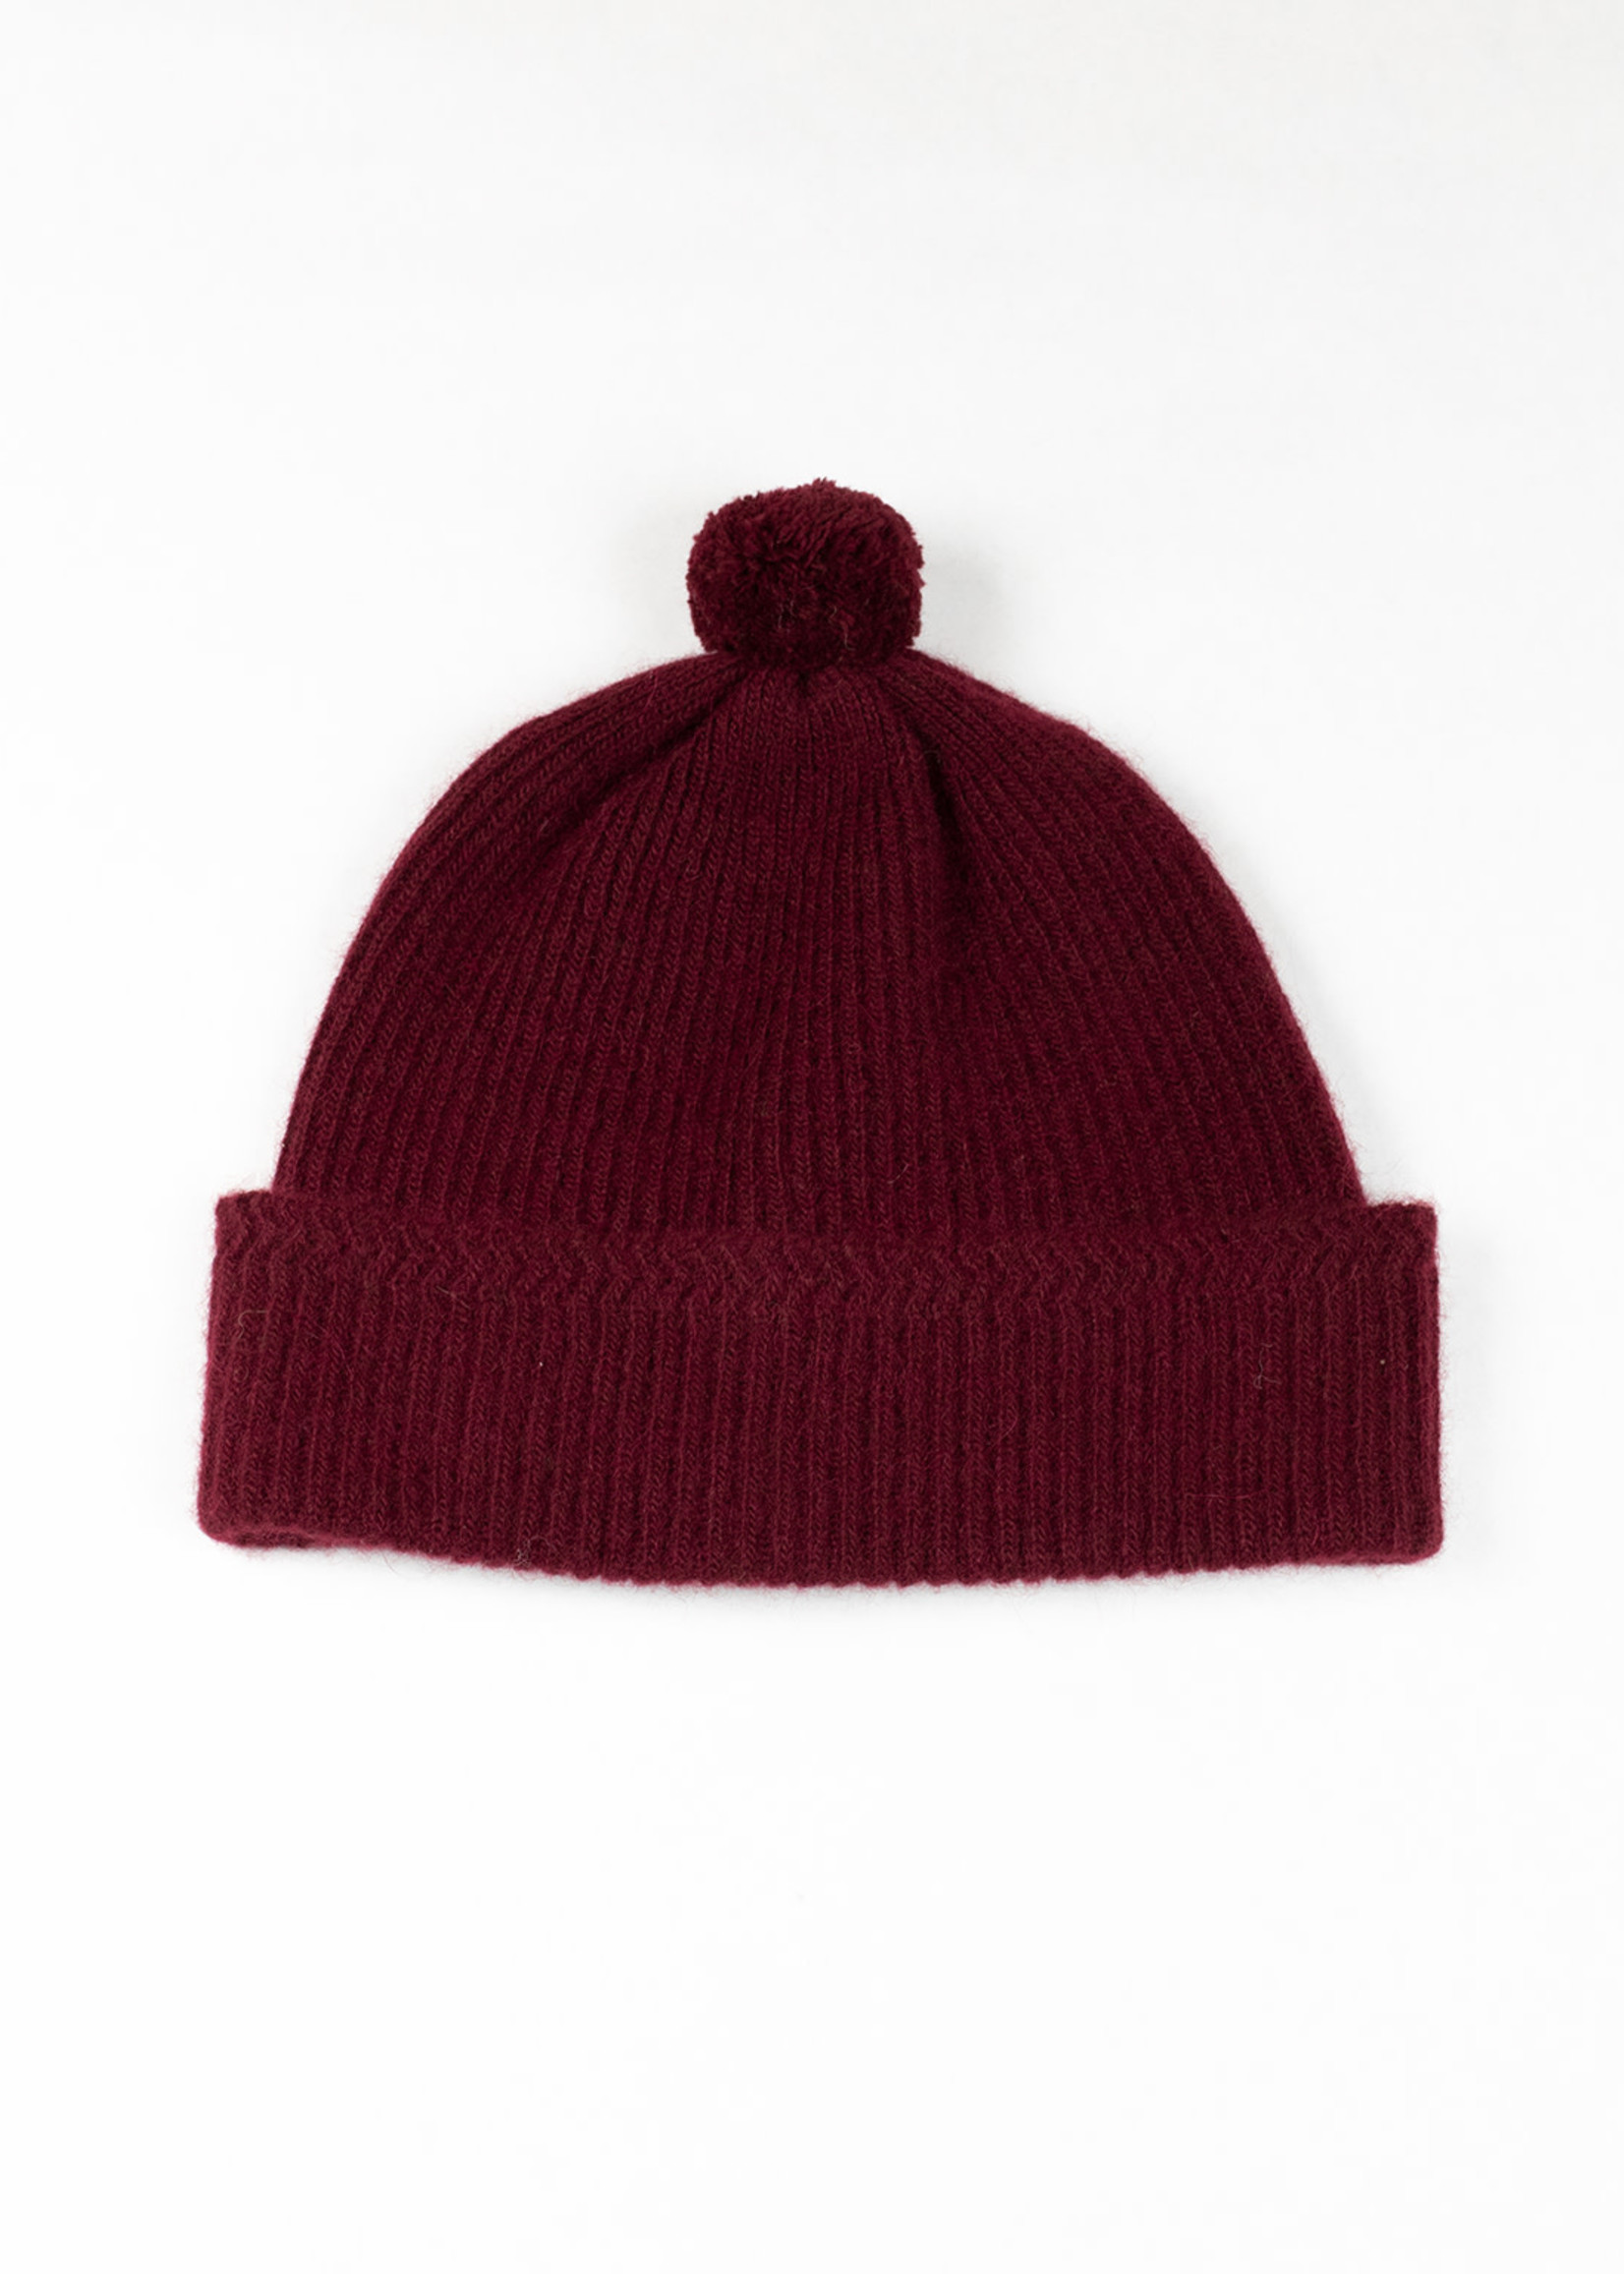 Cableami Alpaca/Wool Knit Bobble Cap Burgundy